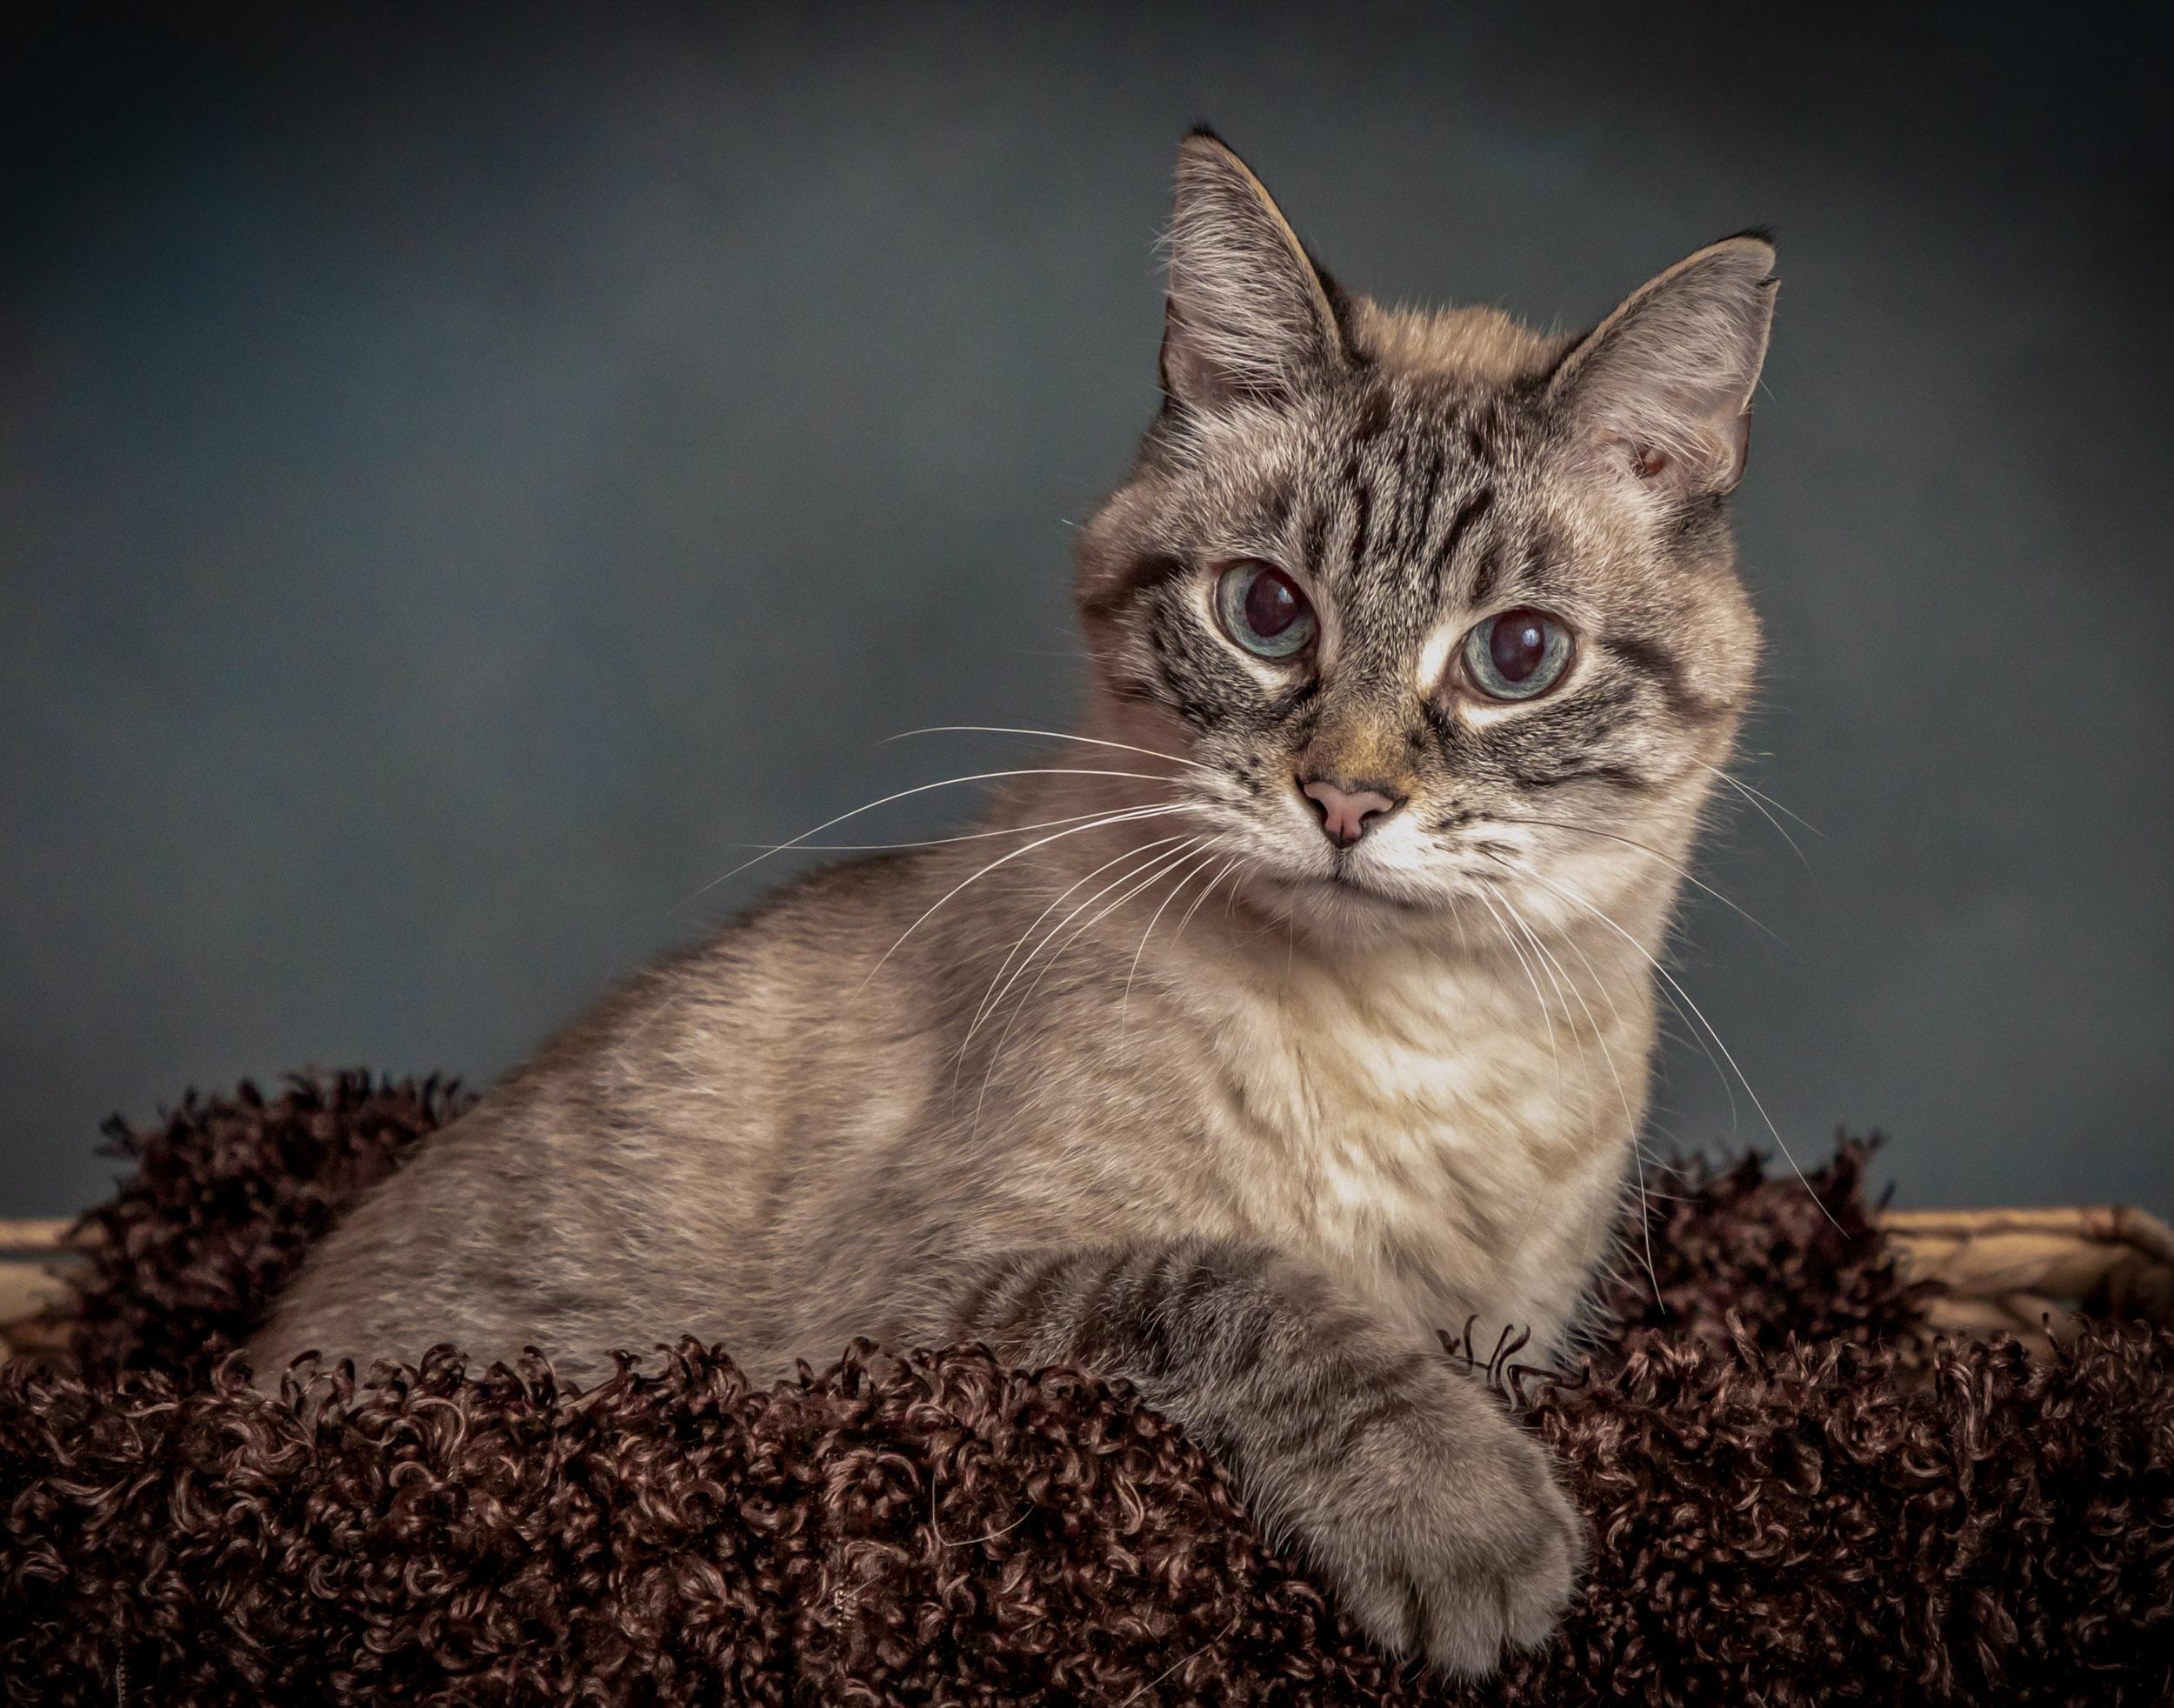 Kitty Cat Pet Photography Portrait